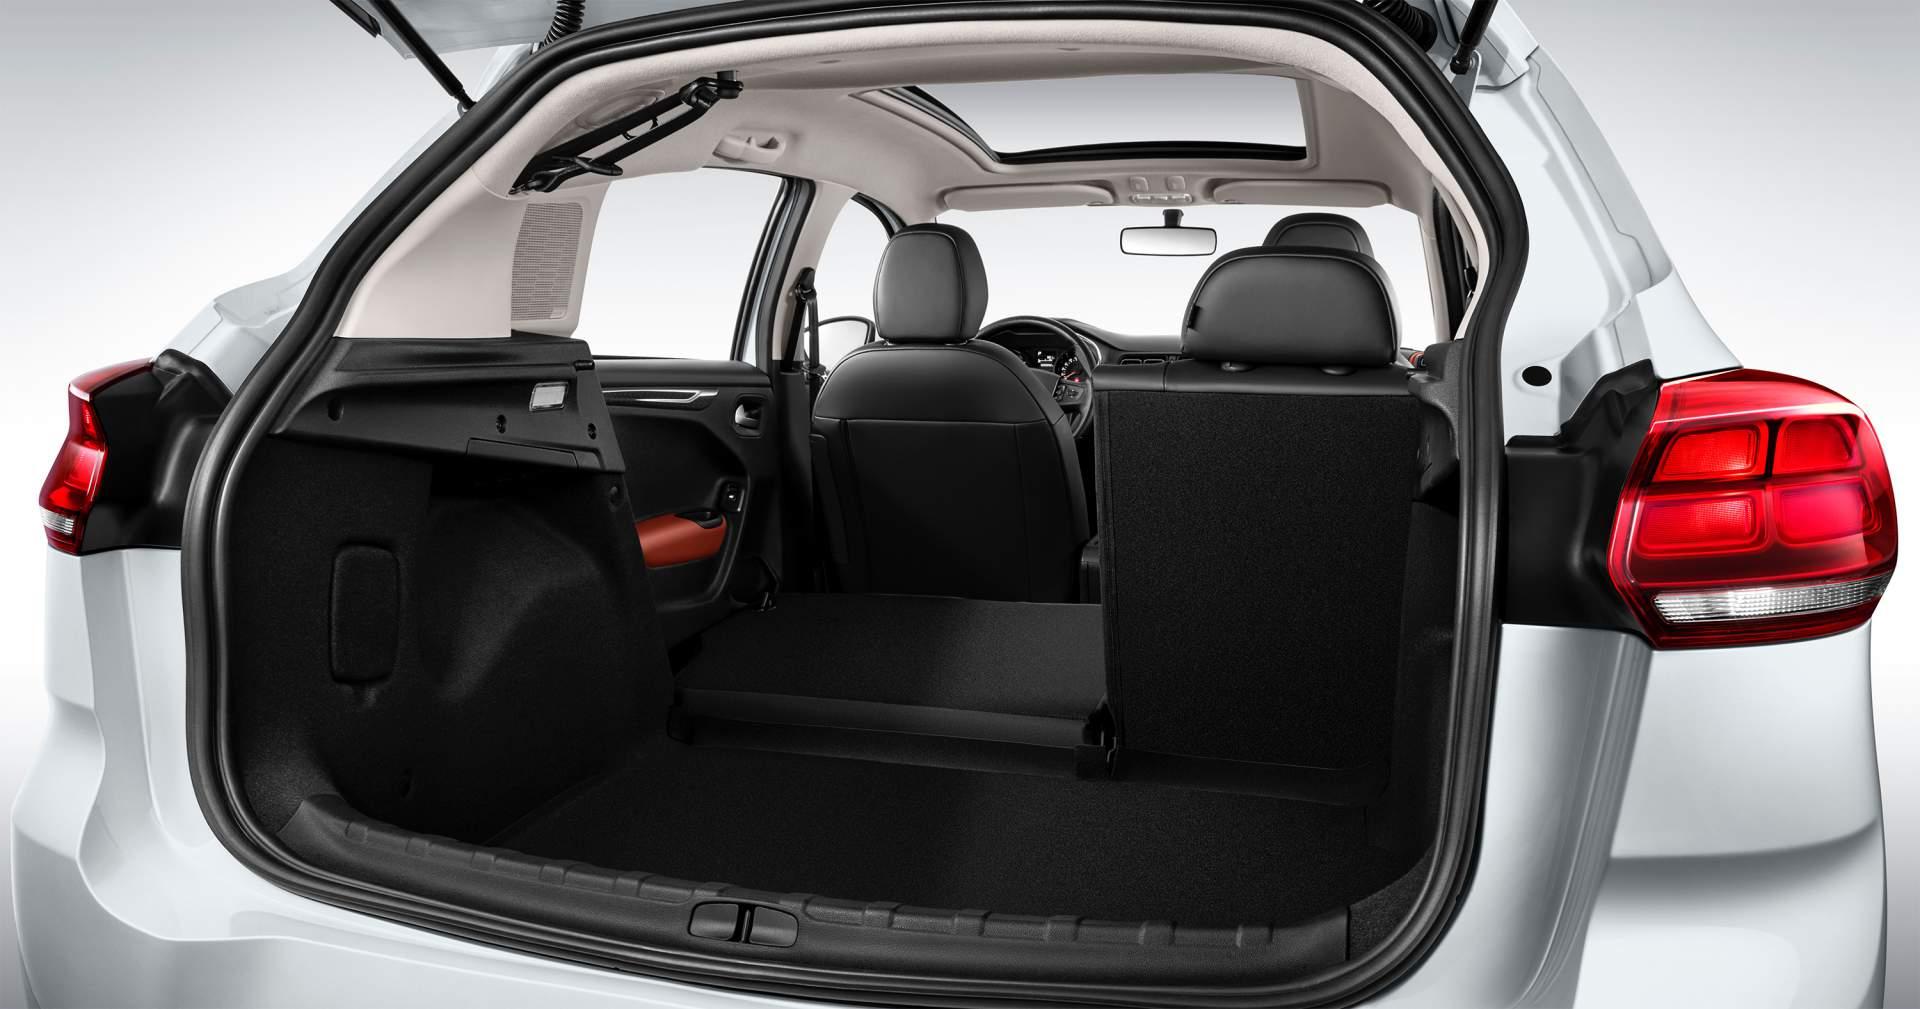 Citroen C3-XR facelift 2019 (5)